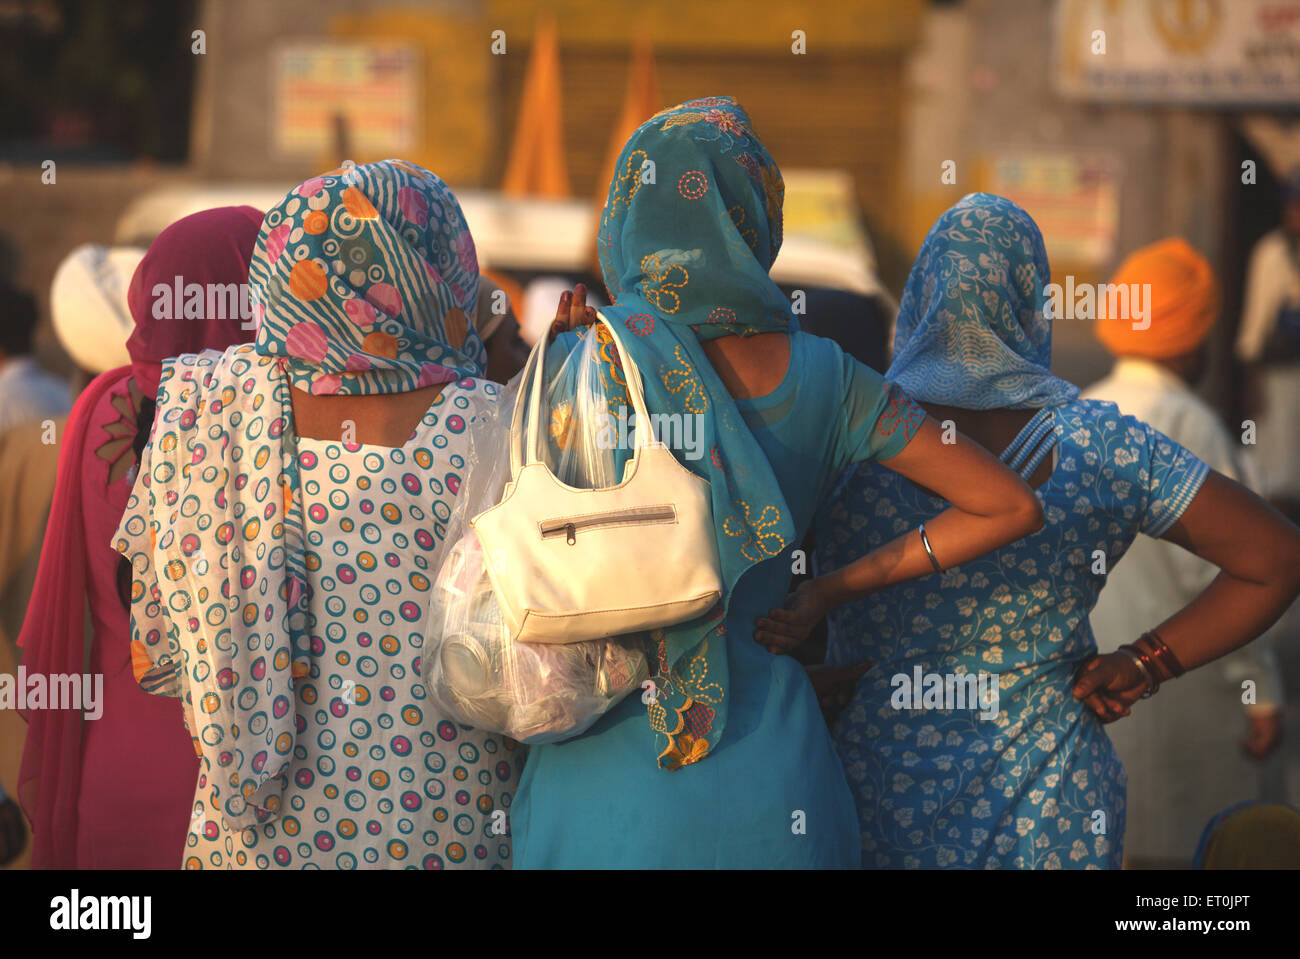 Sikh women watching daredevil stunts Nihangs Sikh warriors celebration Consecration perpetual Guru Granth Sahib - Stock Image